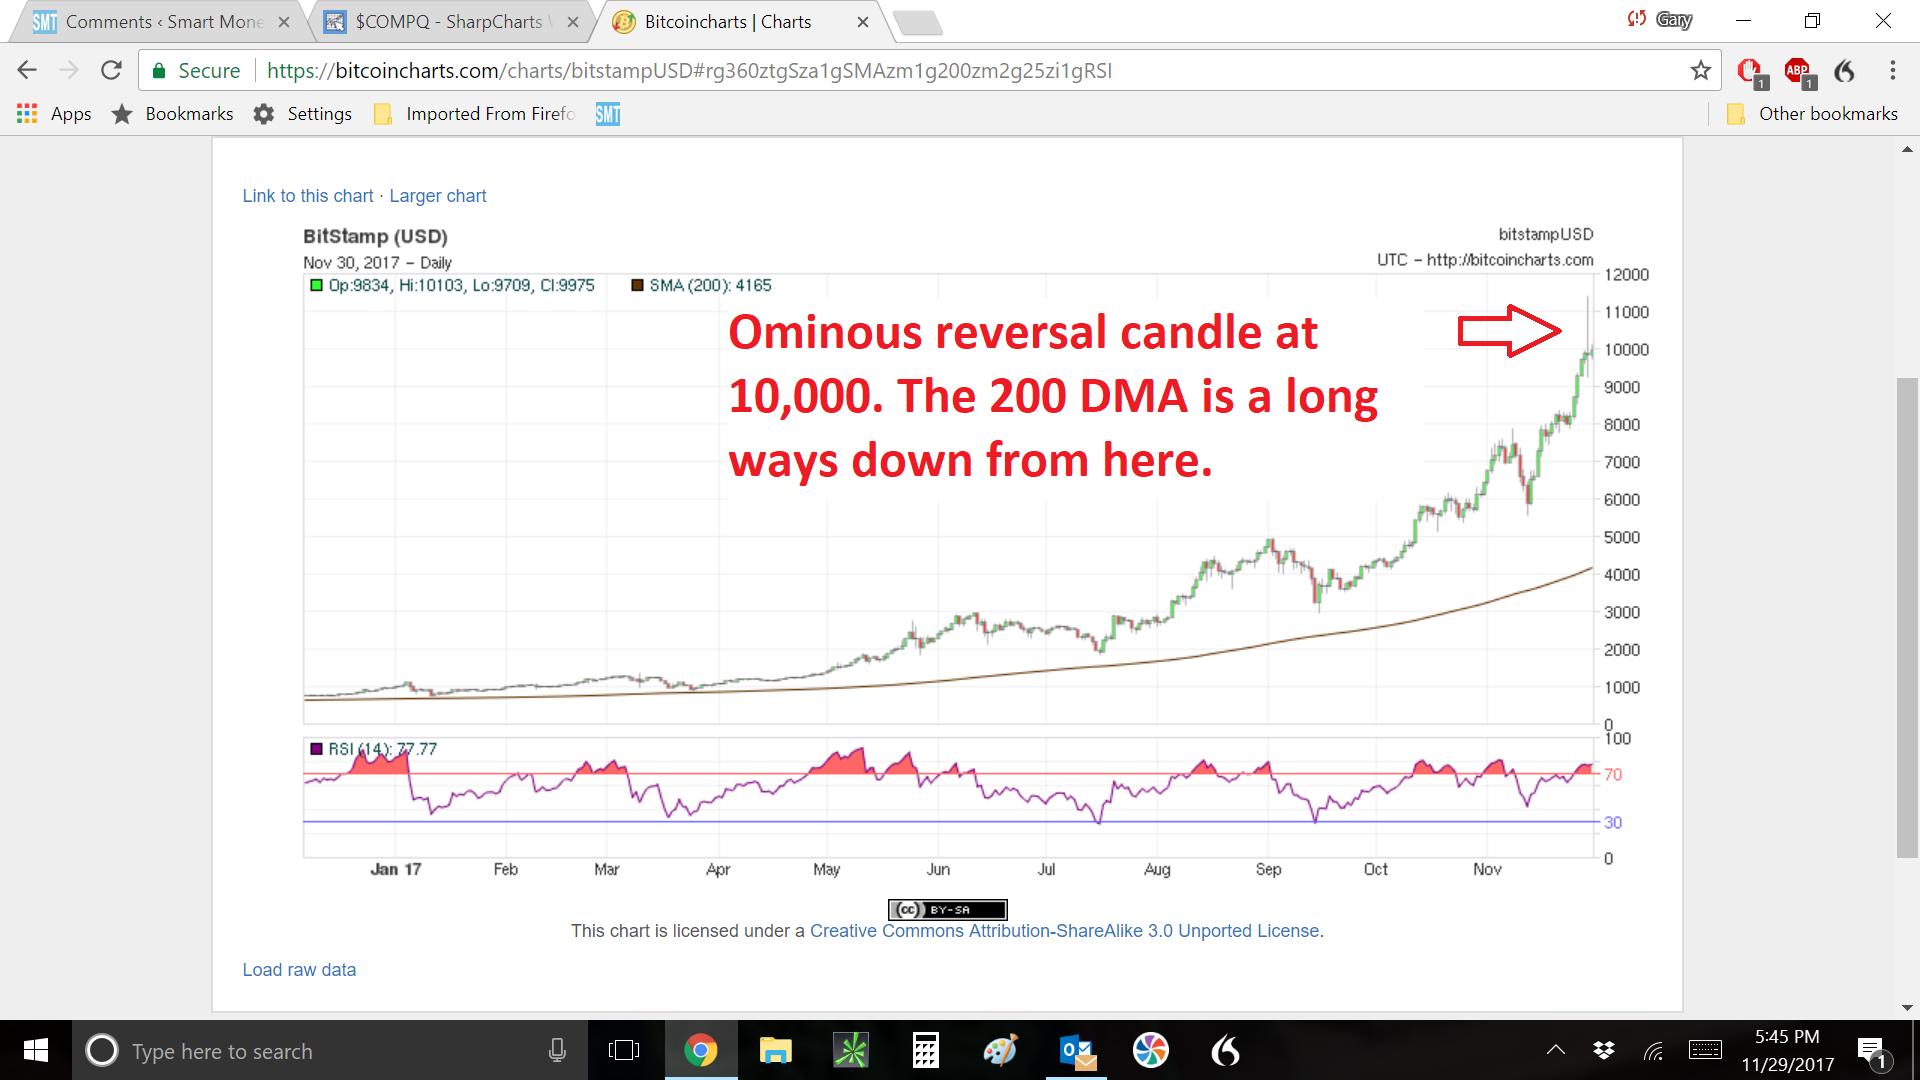 ANATOMY OF A BUBBLE 101 - Smart Money Tracker